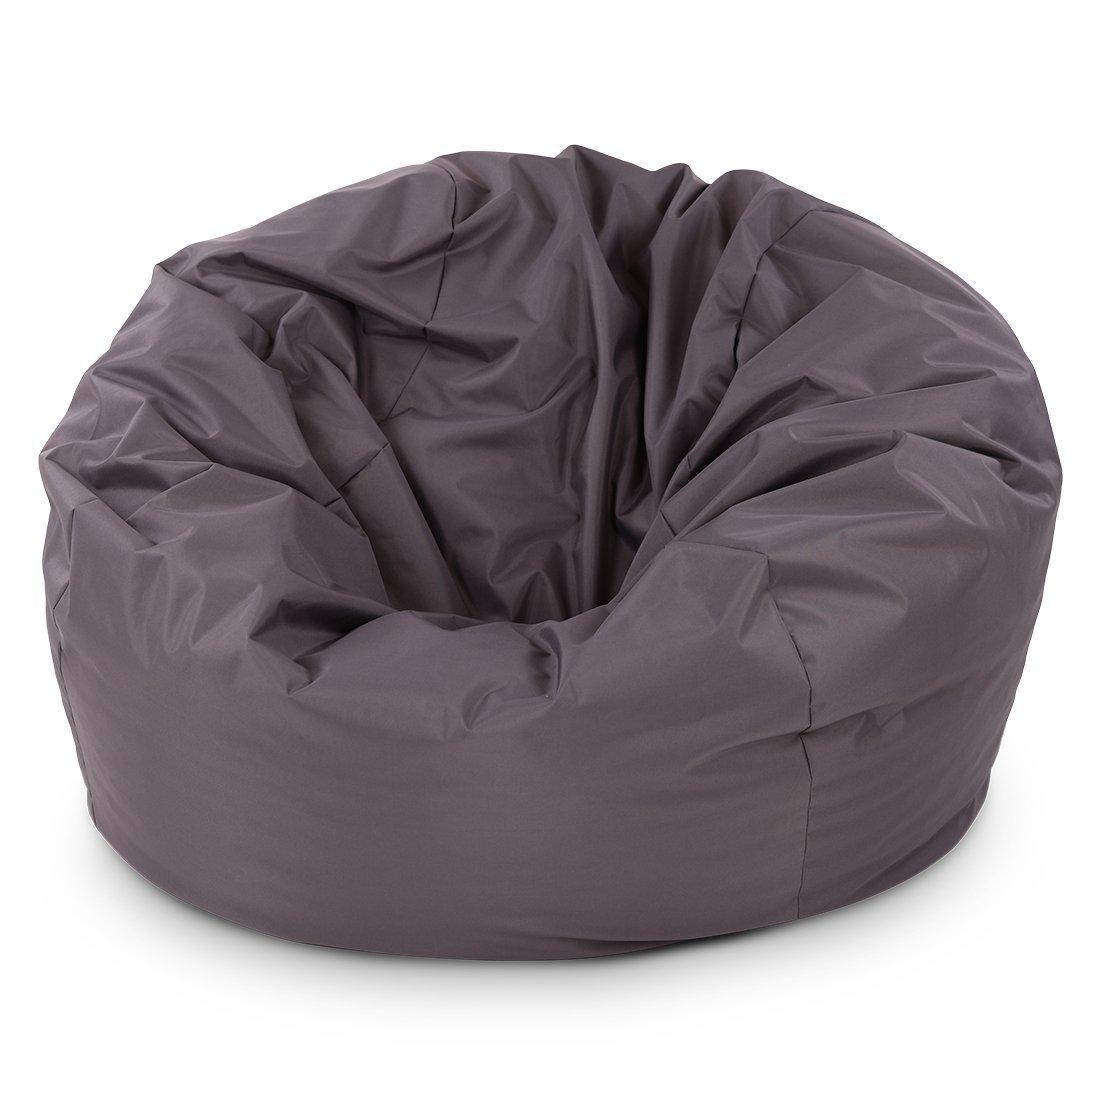 foam bean bag chair folding gunde memory home furniture design